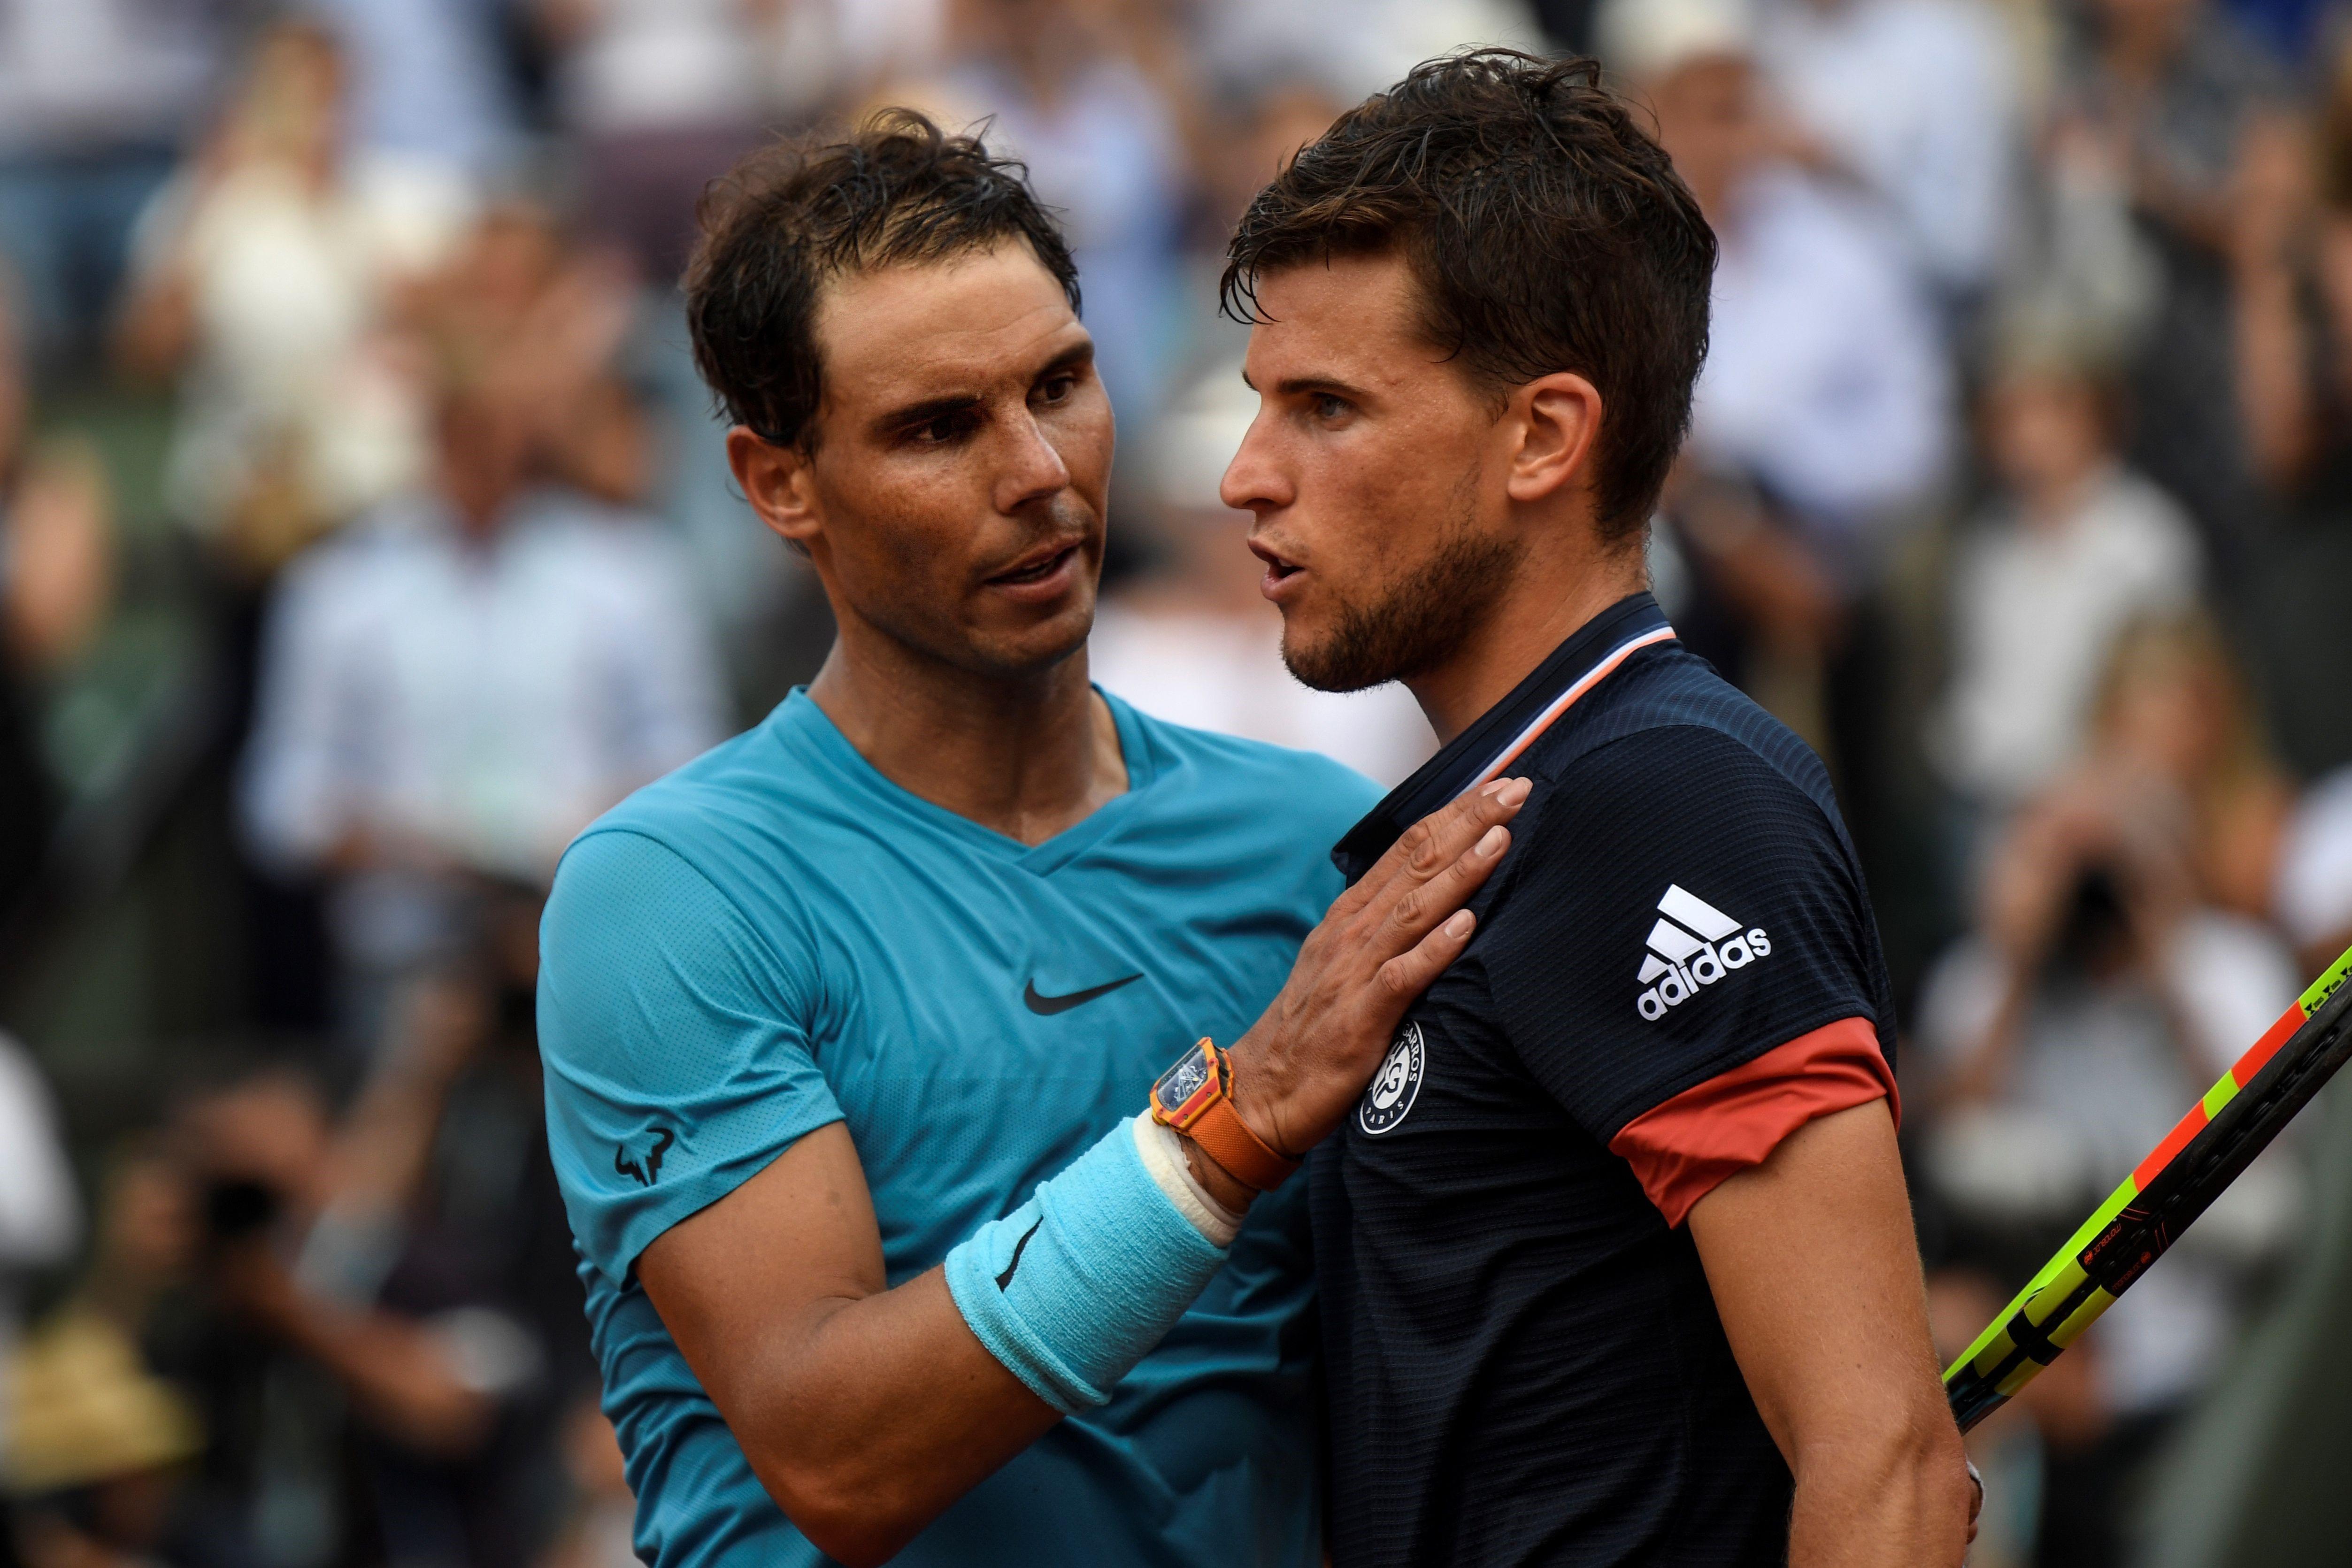 Rafael Nadal & Dominic Thiem